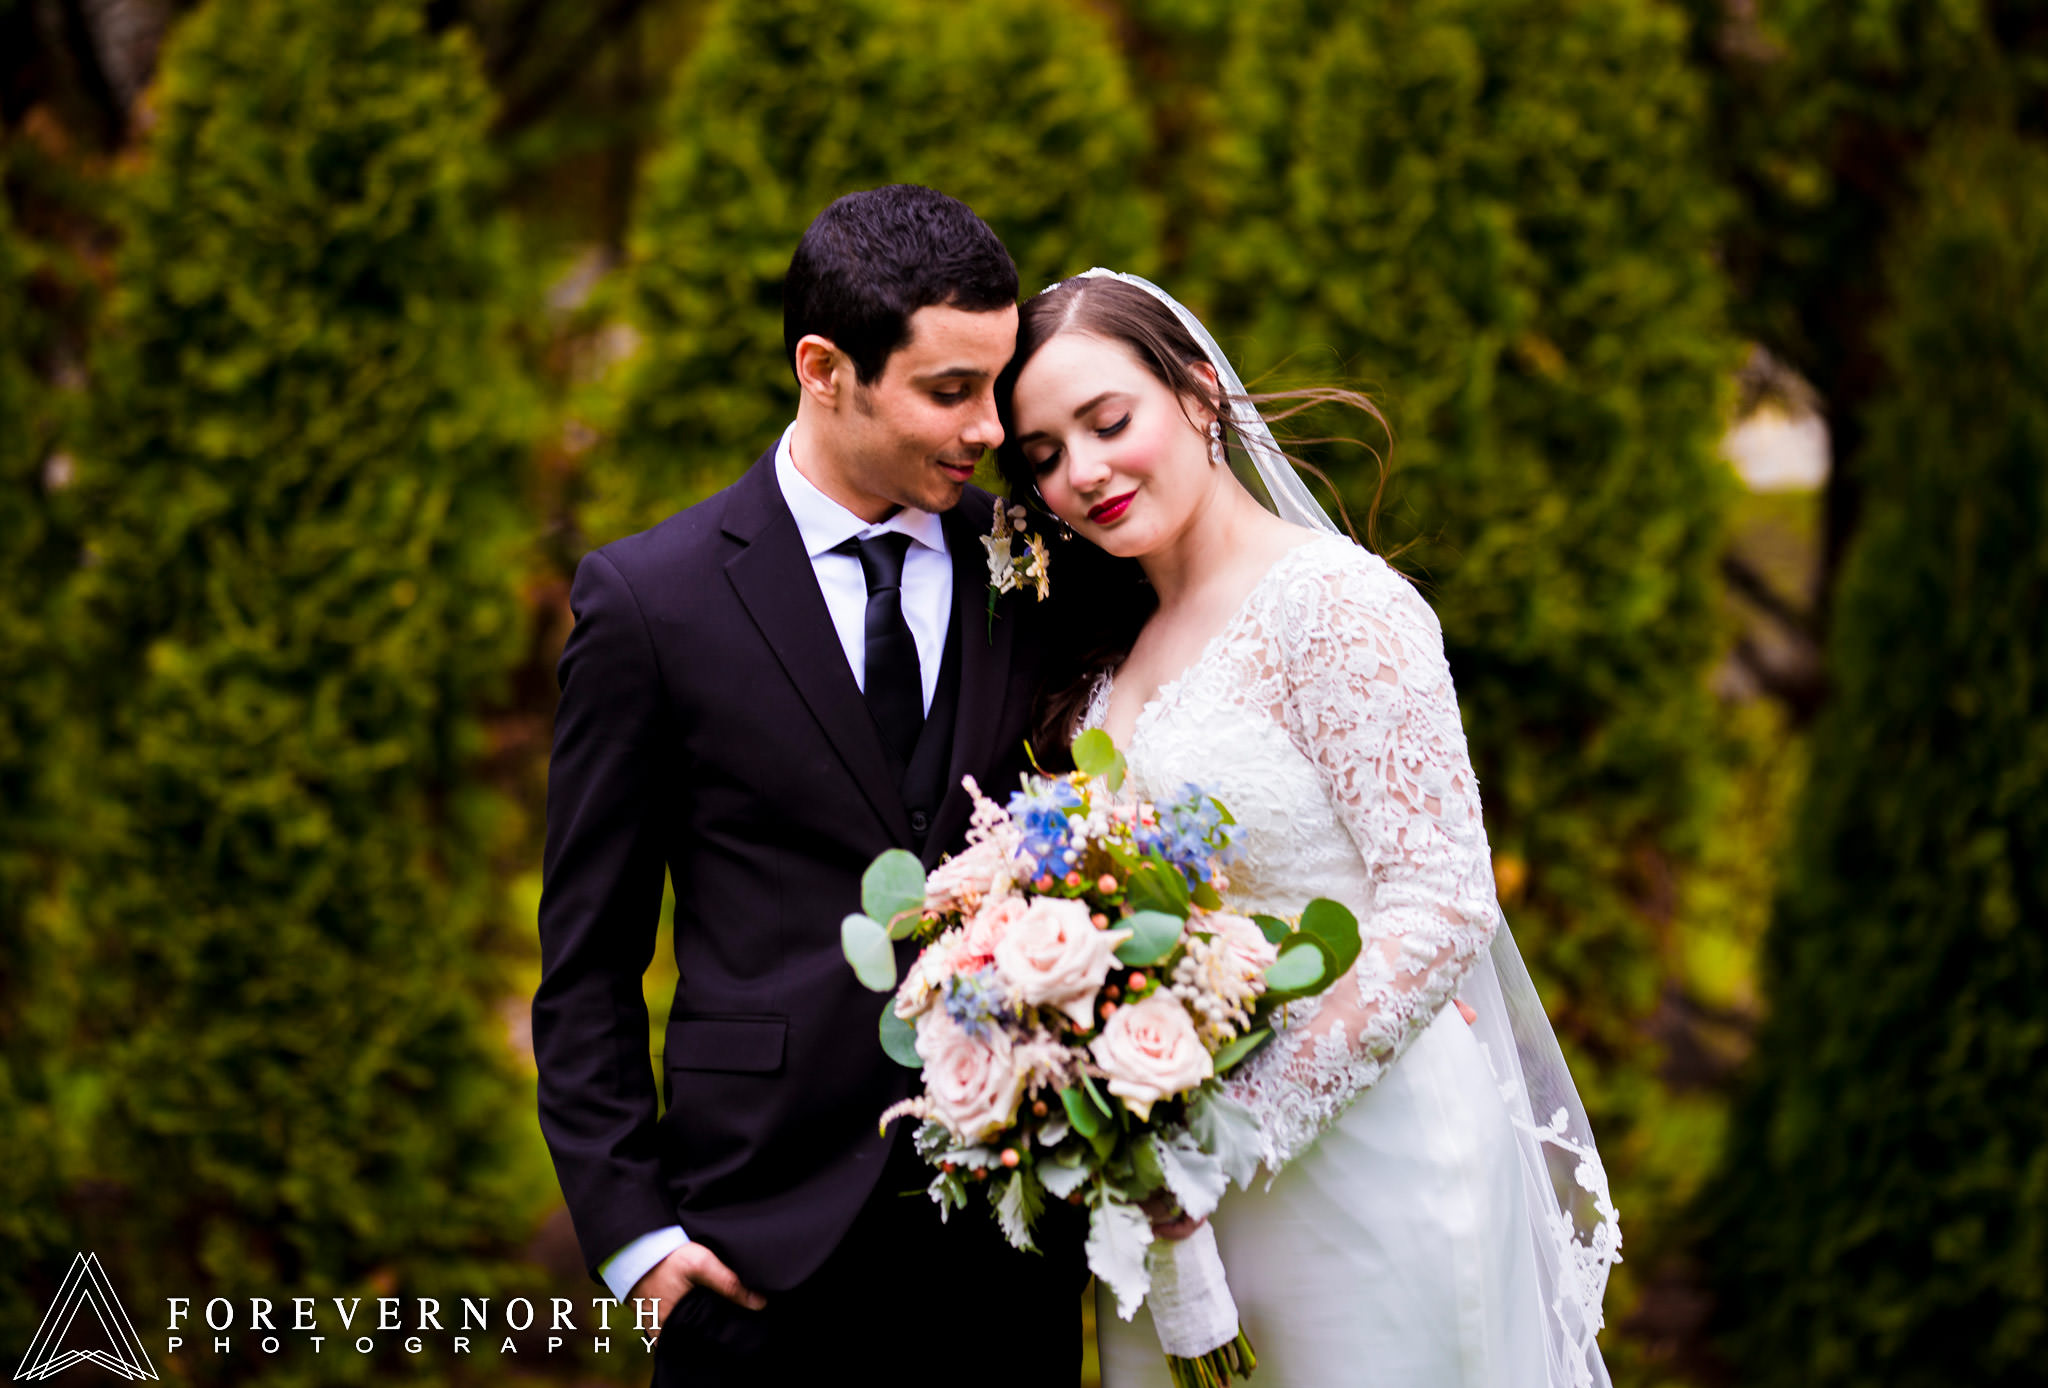 Rivera-Bradford-Estate-Wedding-Photographer-48.JPG